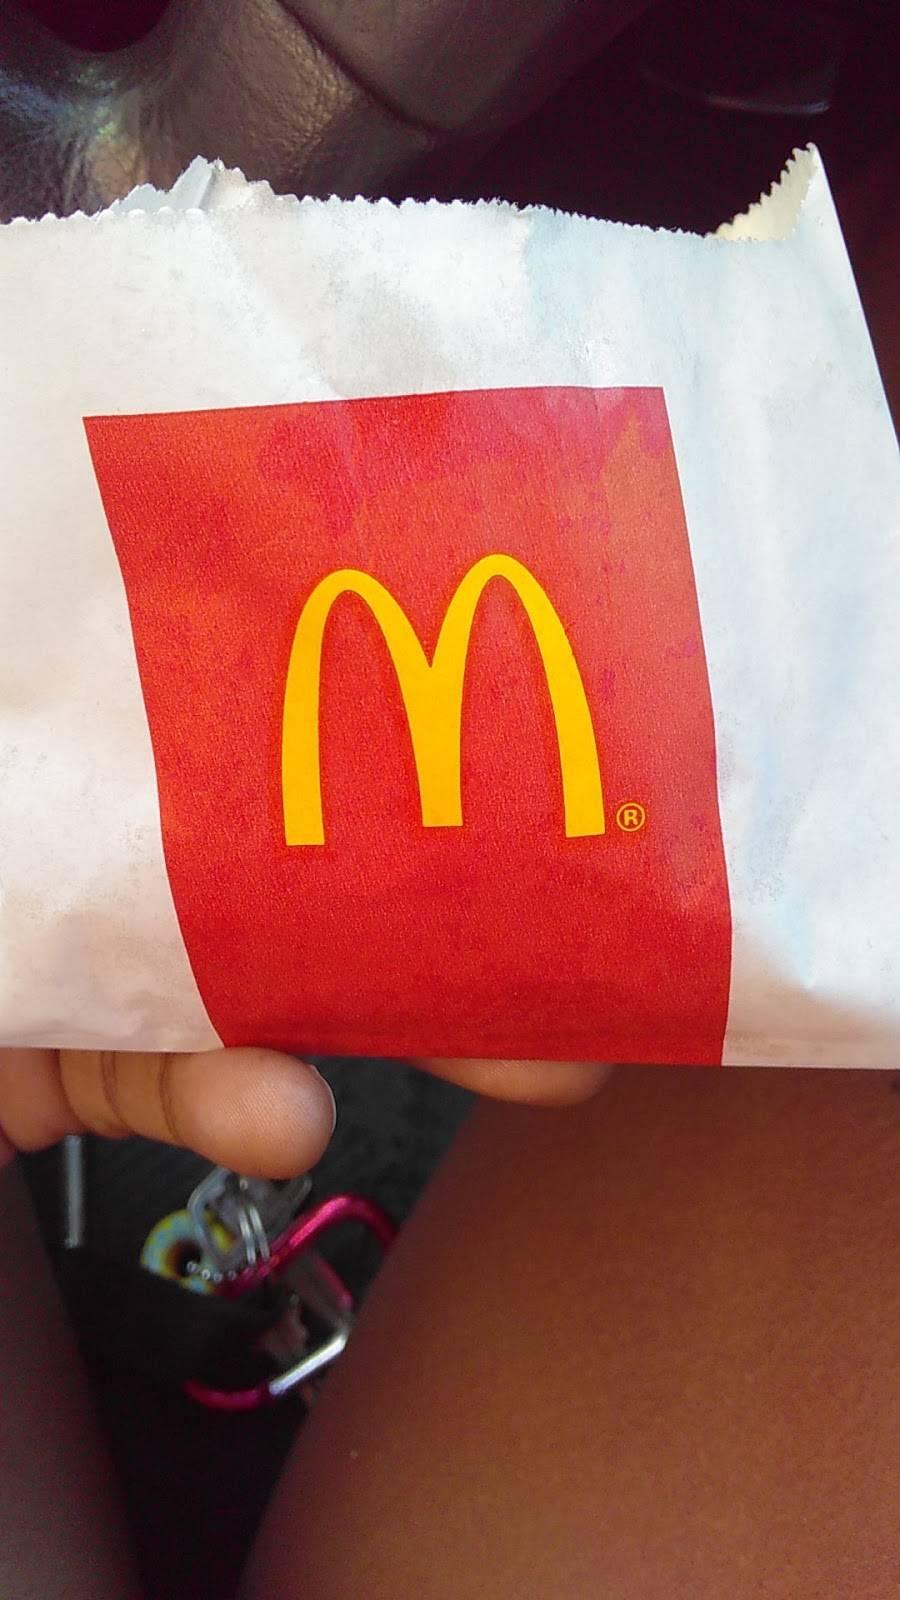 McDonalds - cafe  | Photo 3 of 8 | Address: 6906 N 56th St, Tampa, FL 33617, USA | Phone: (813) 985-1270